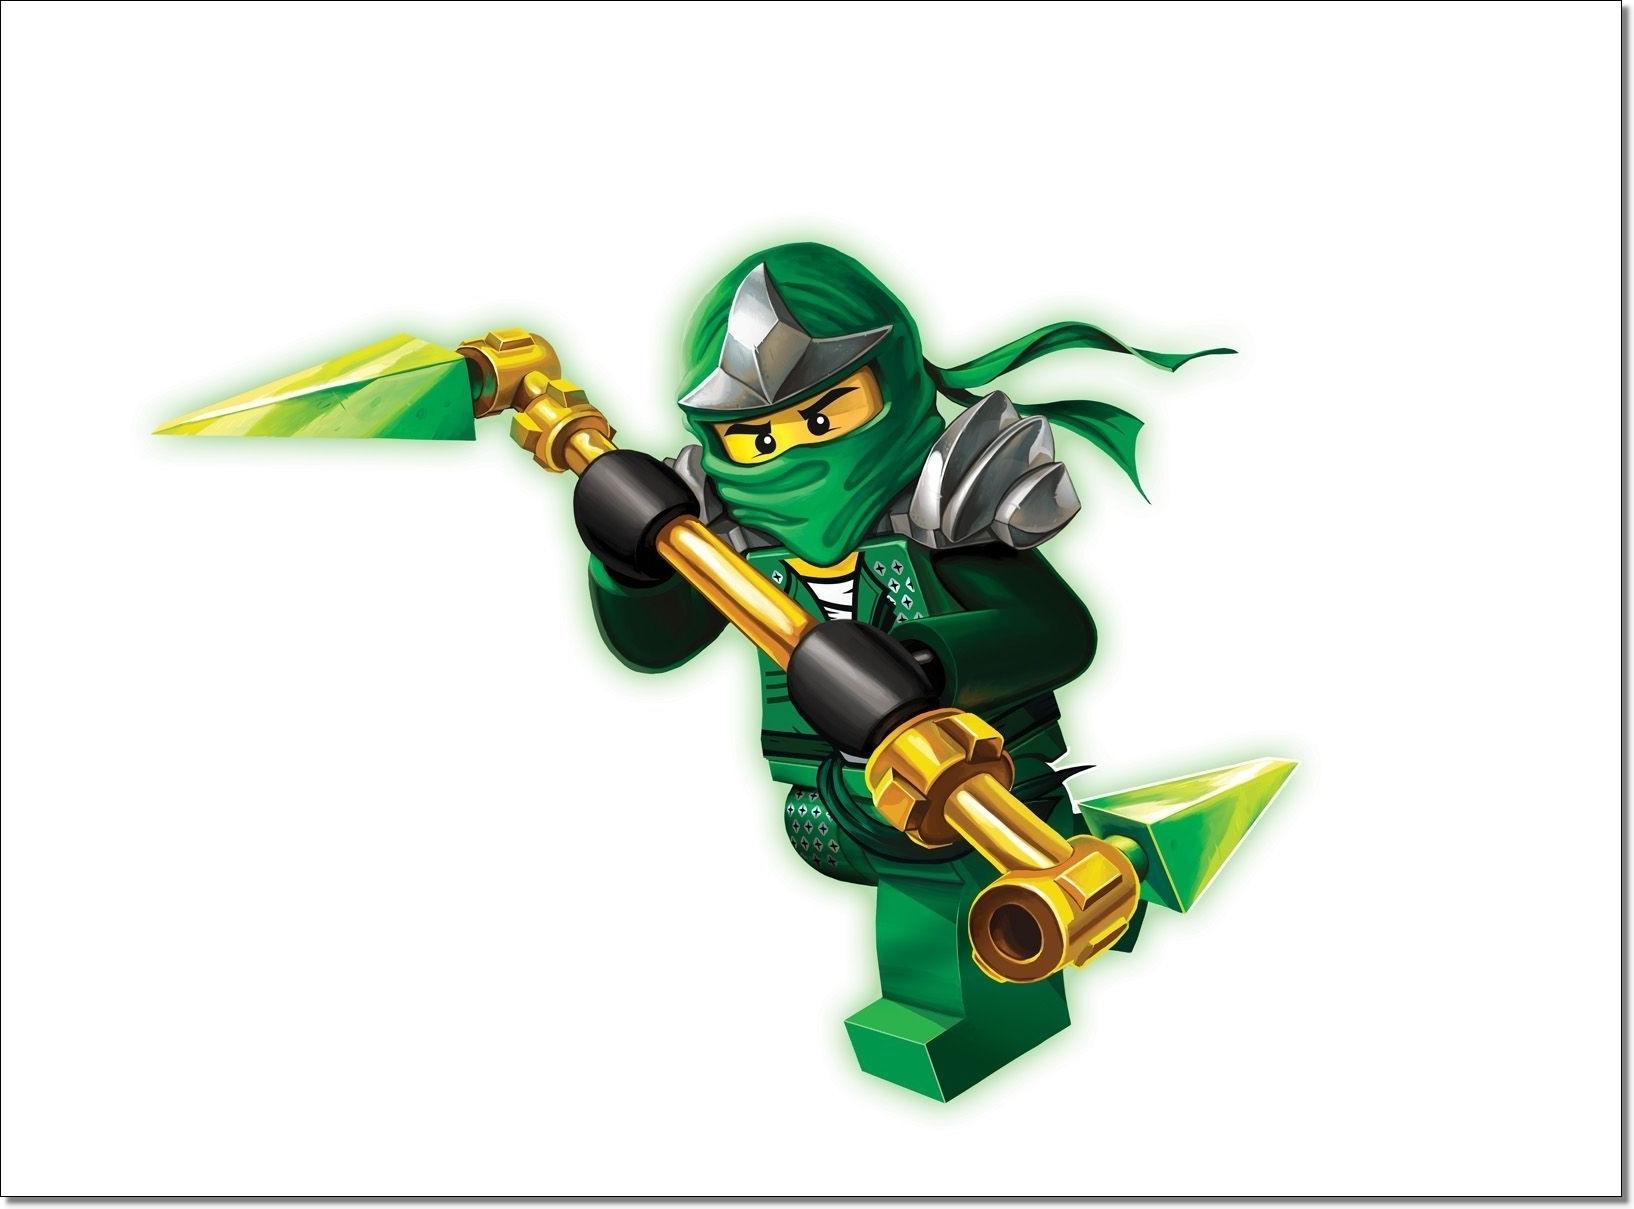 Lego Ninjago Clipart.